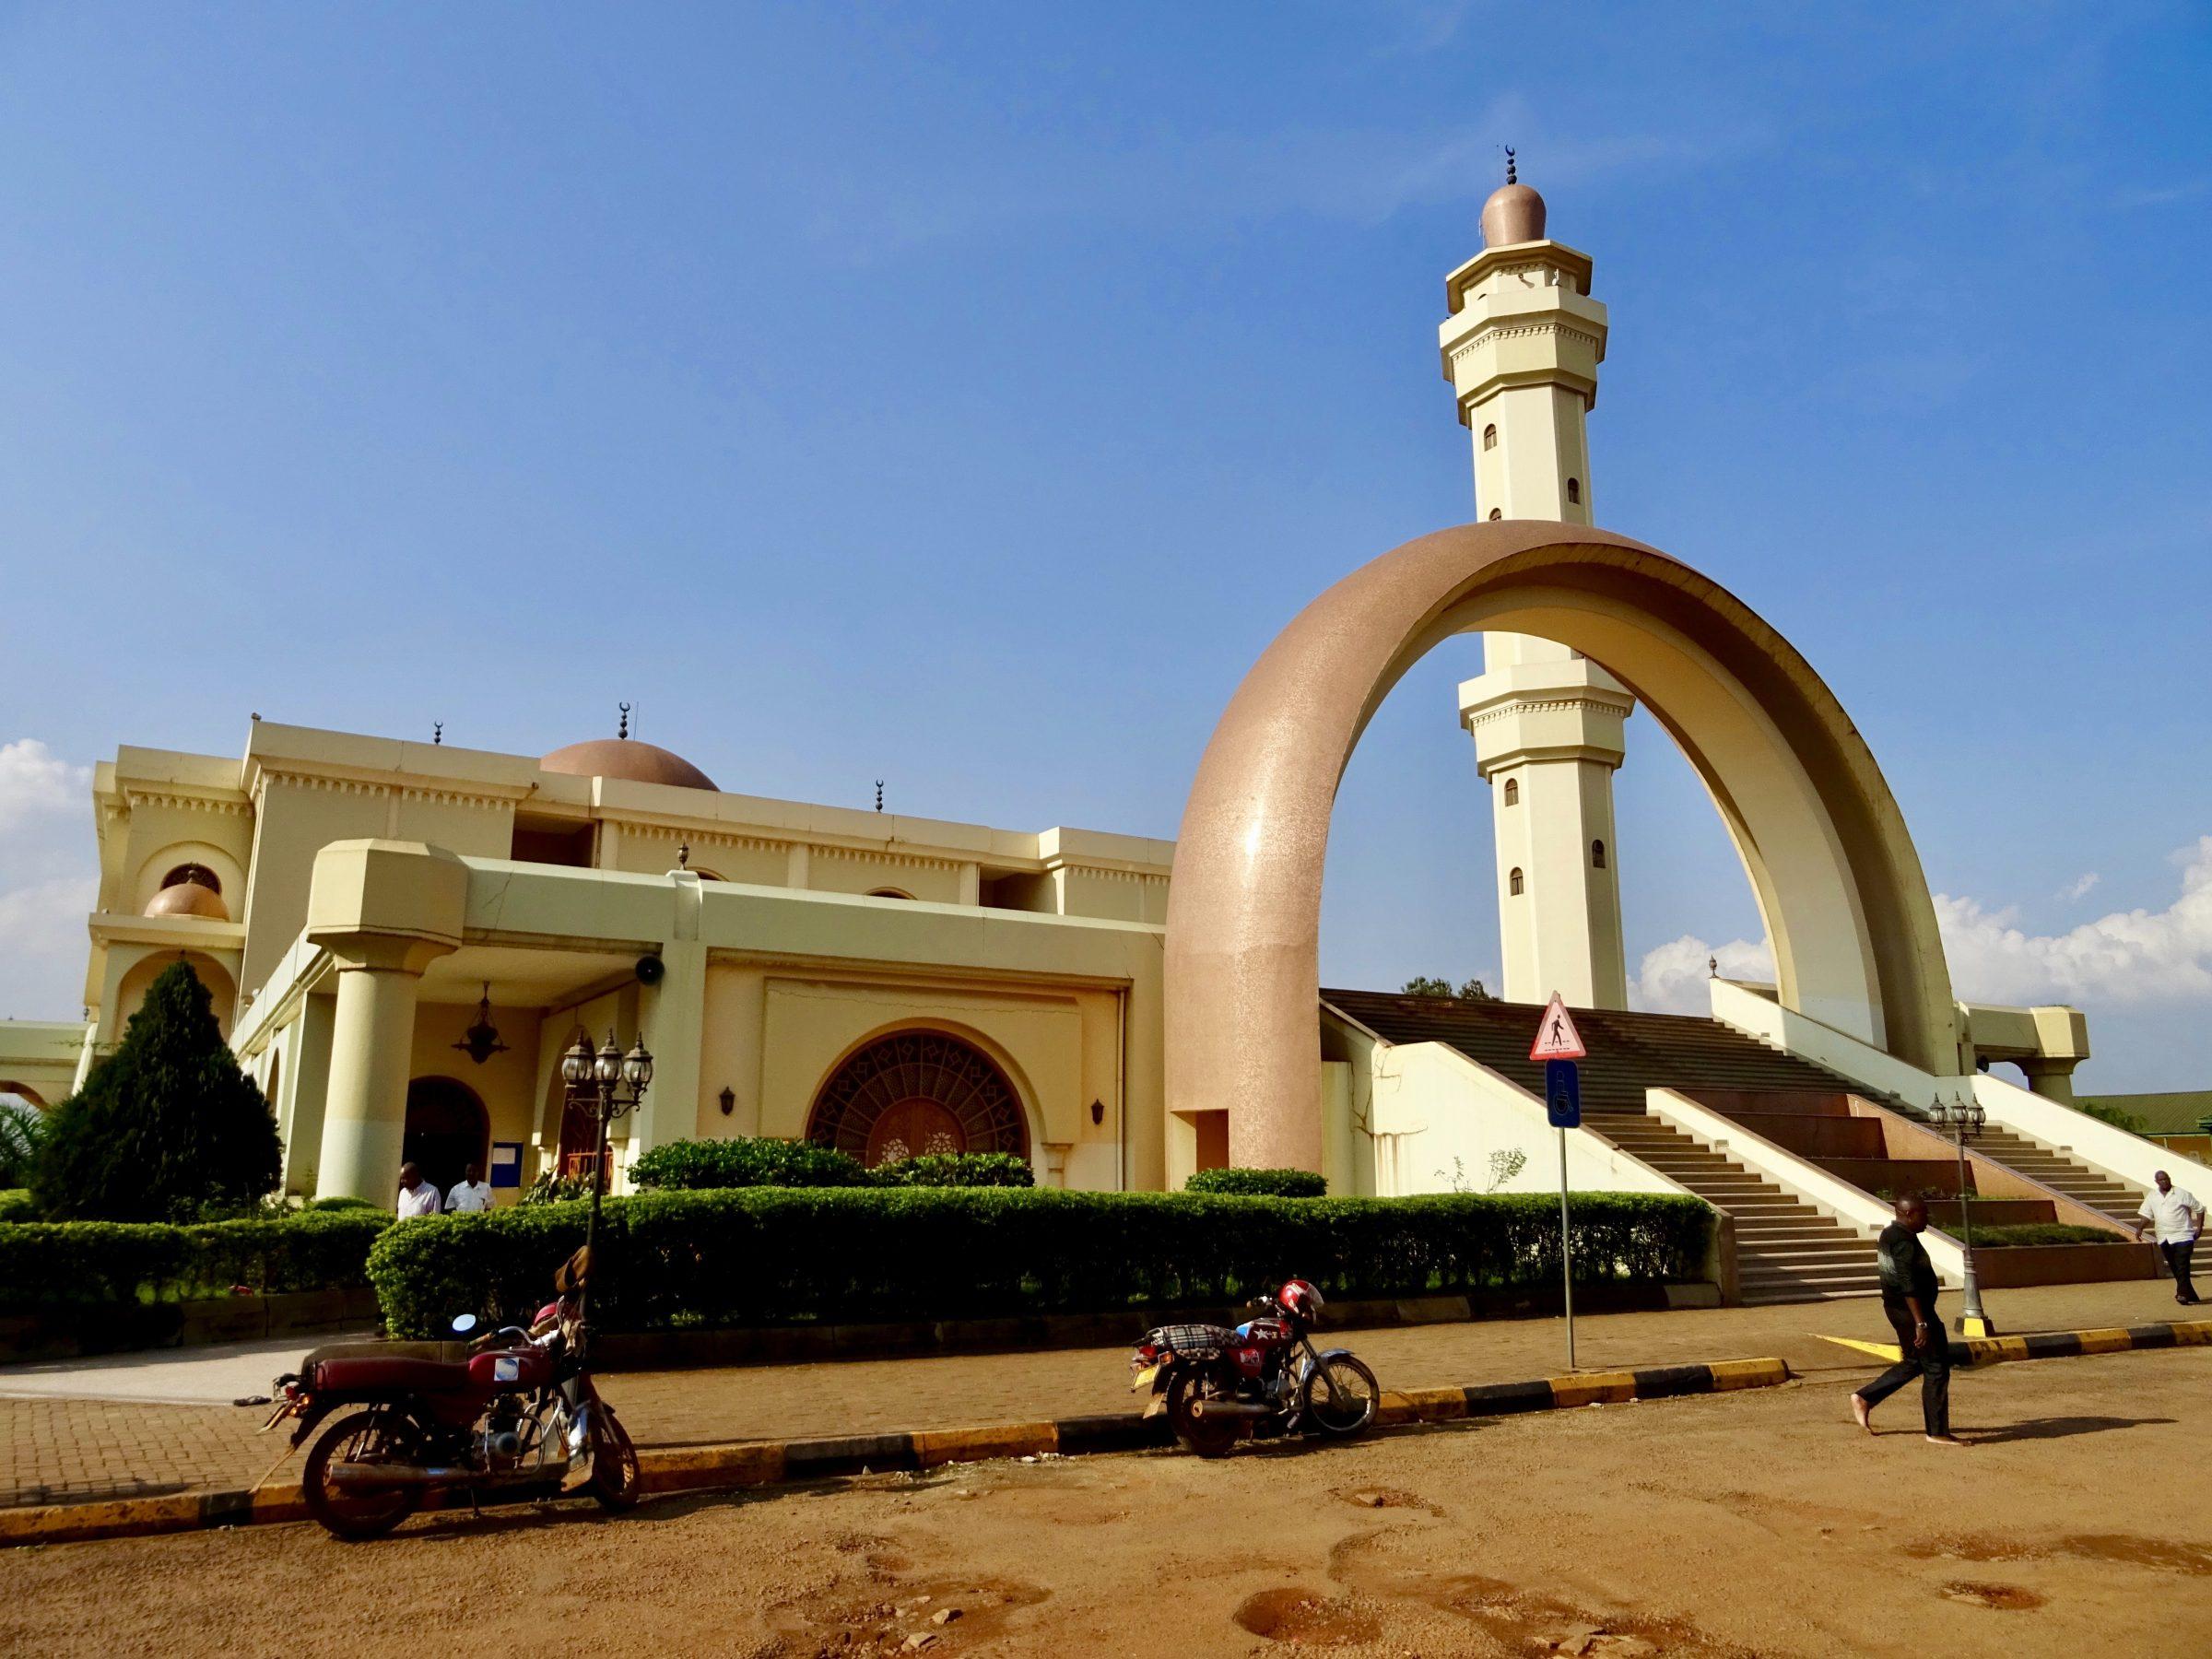 Uganda National Mosque (voorheen Gaddafi National Mosque) in Kampala